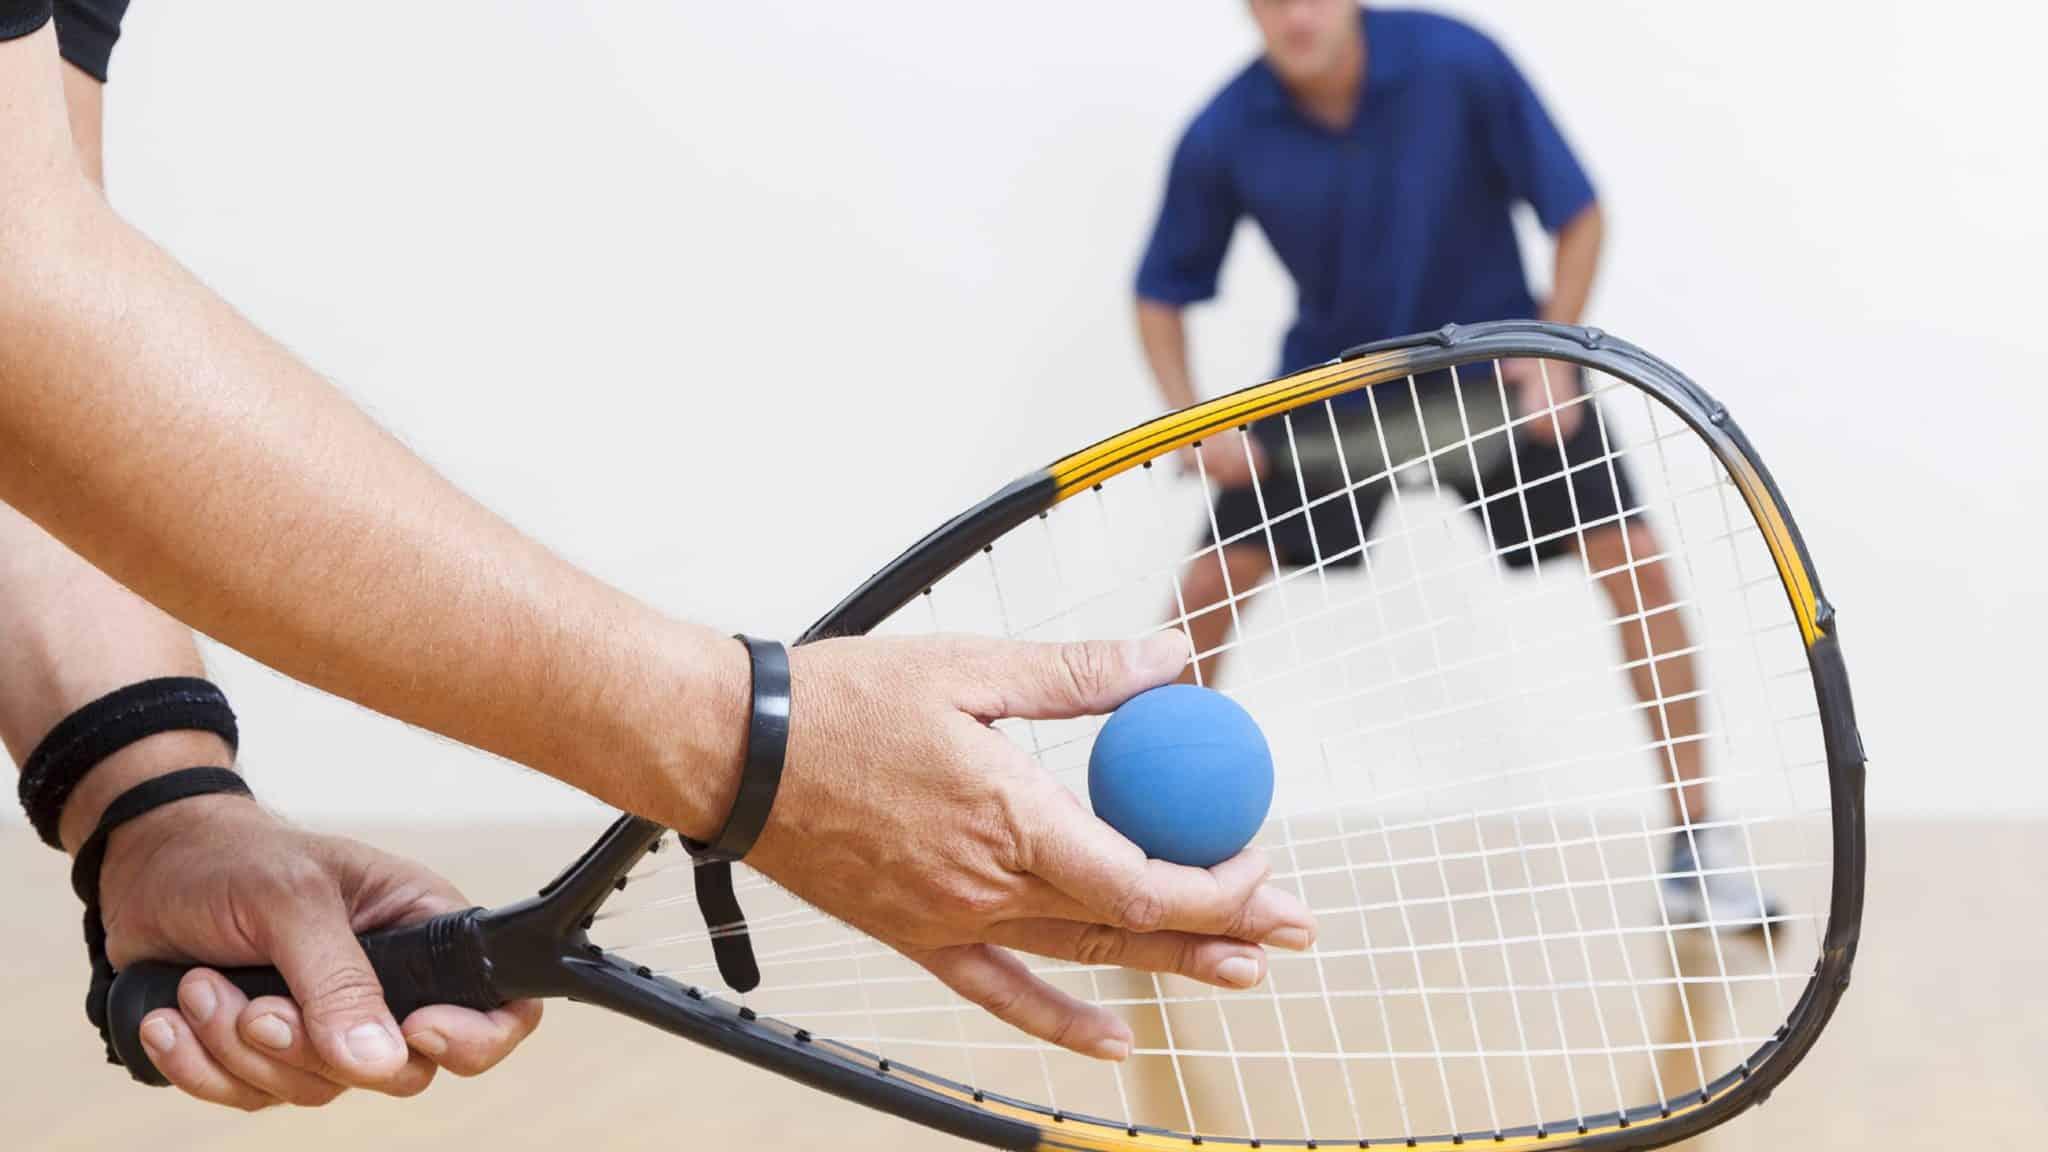 racquetball general